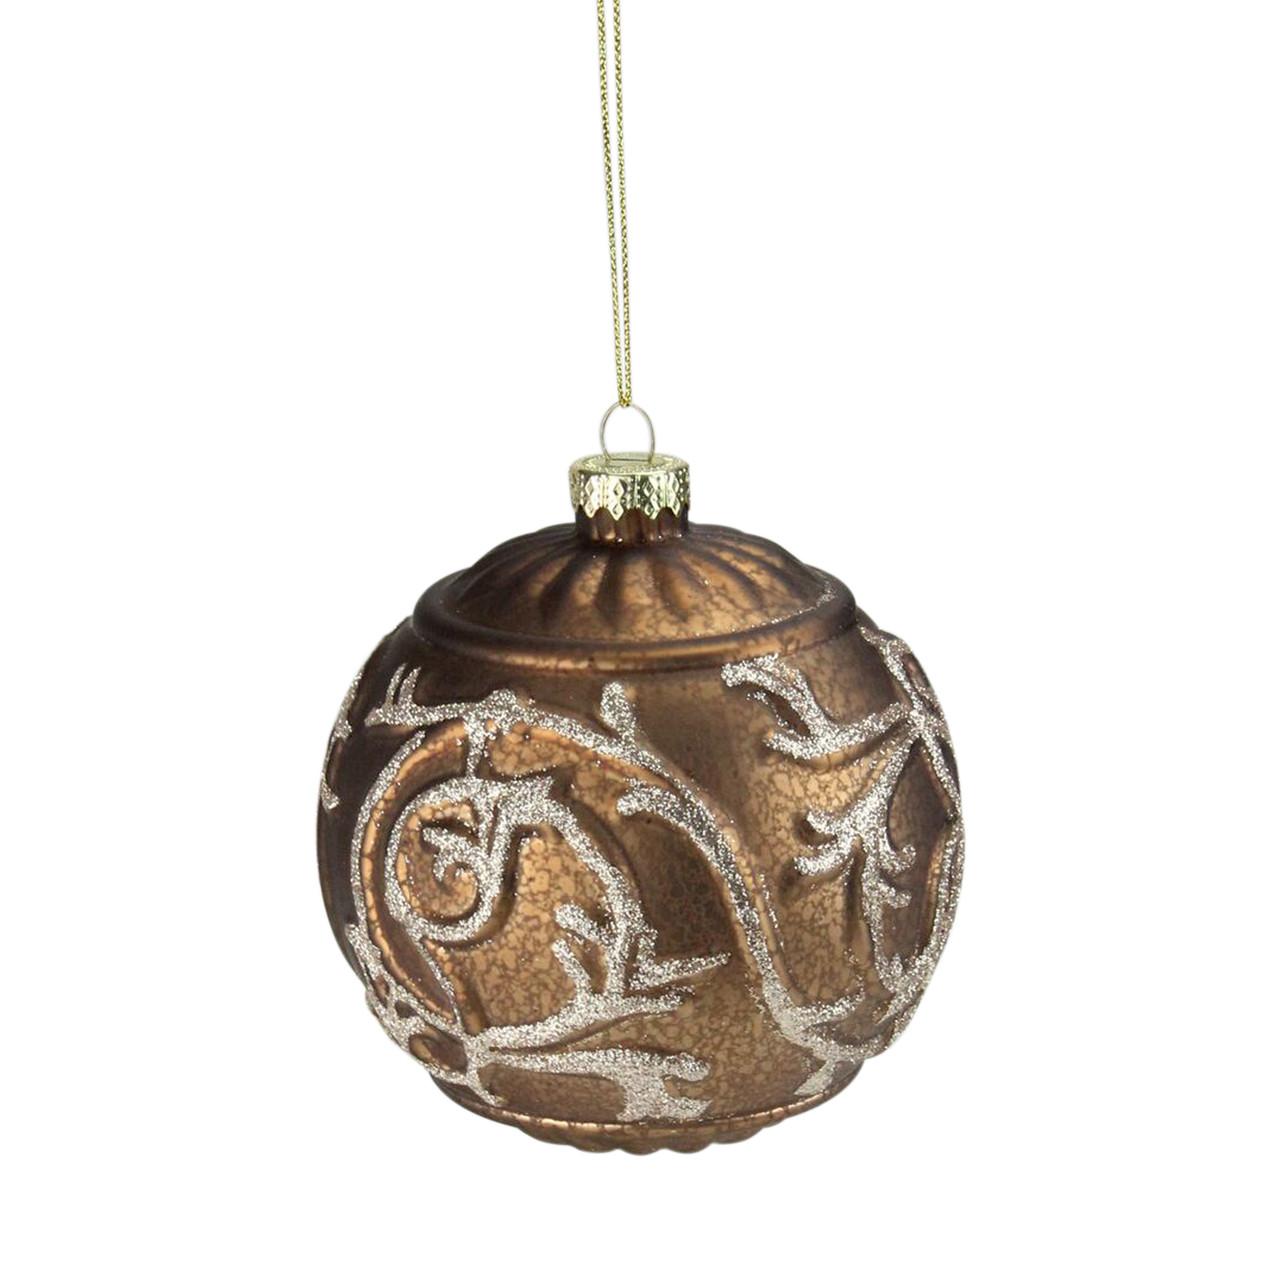 Cheer Glitter Ball ornament